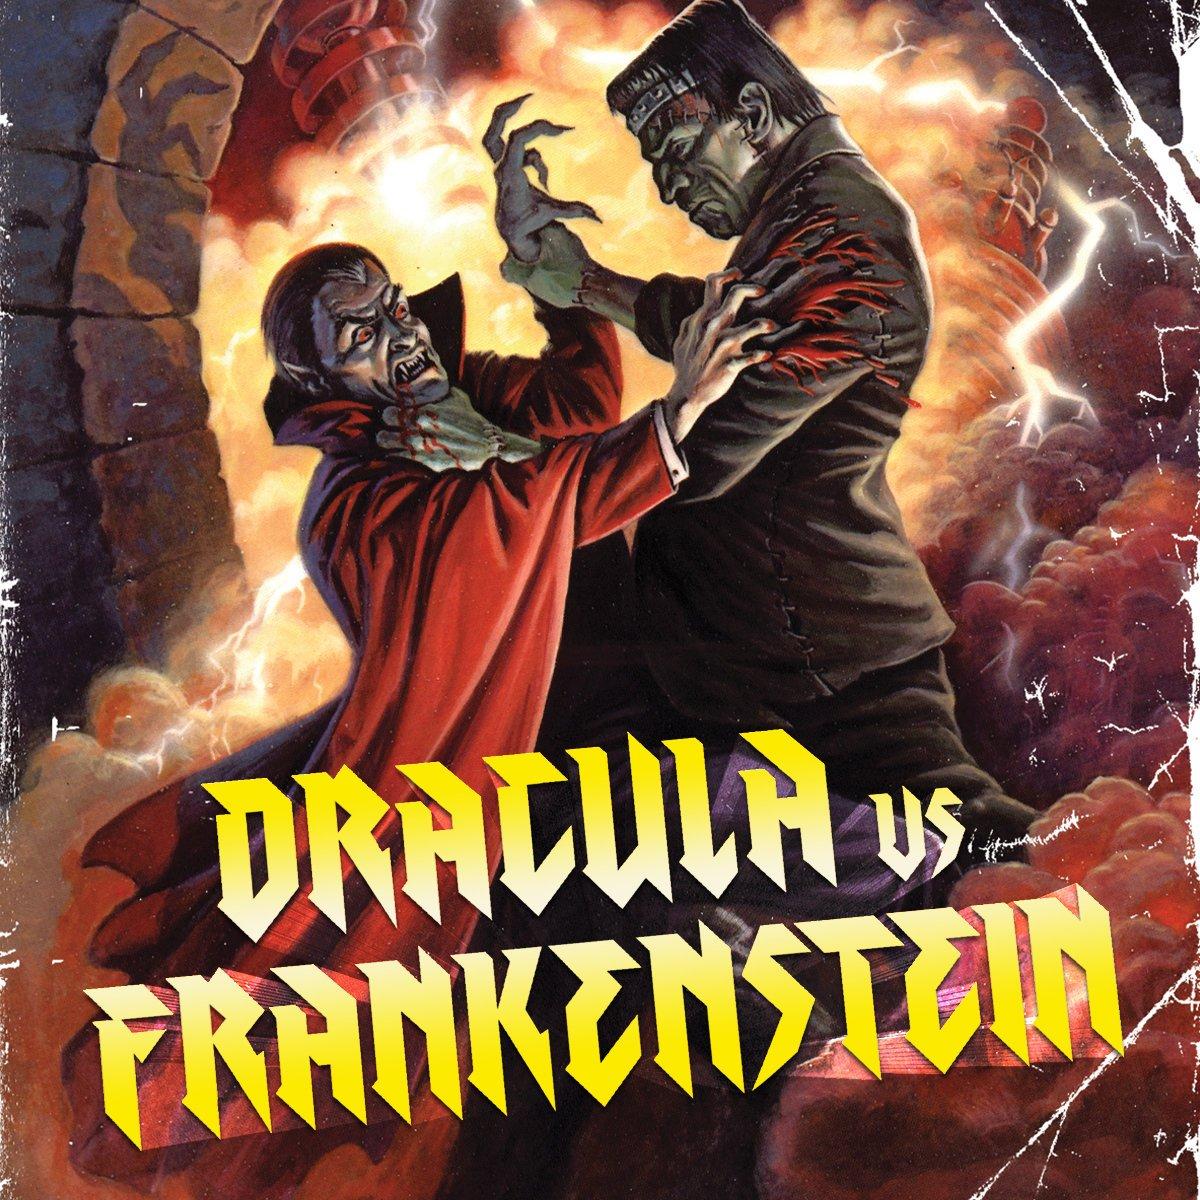 Image result for Frankenstein vs. Dracula